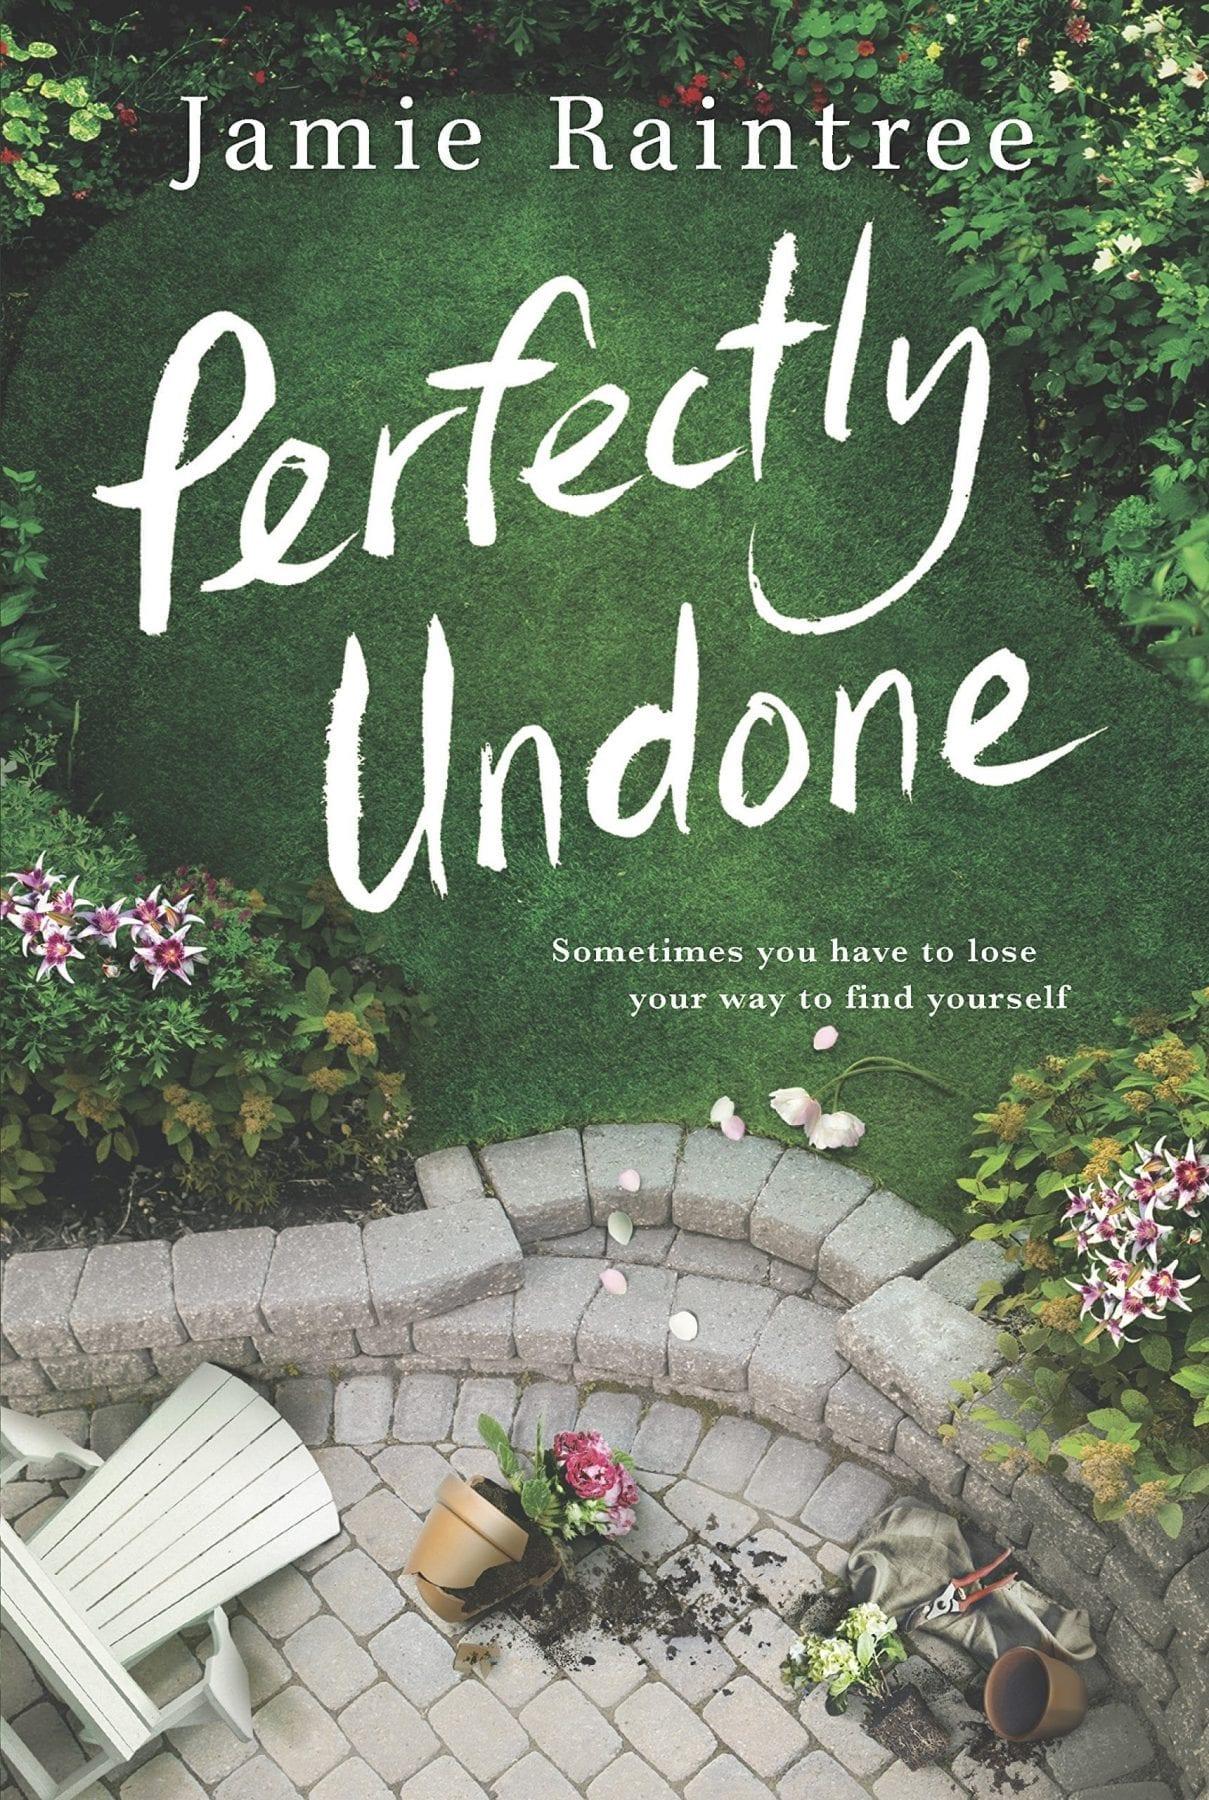 Perfectly Undone by Jamie Raintree